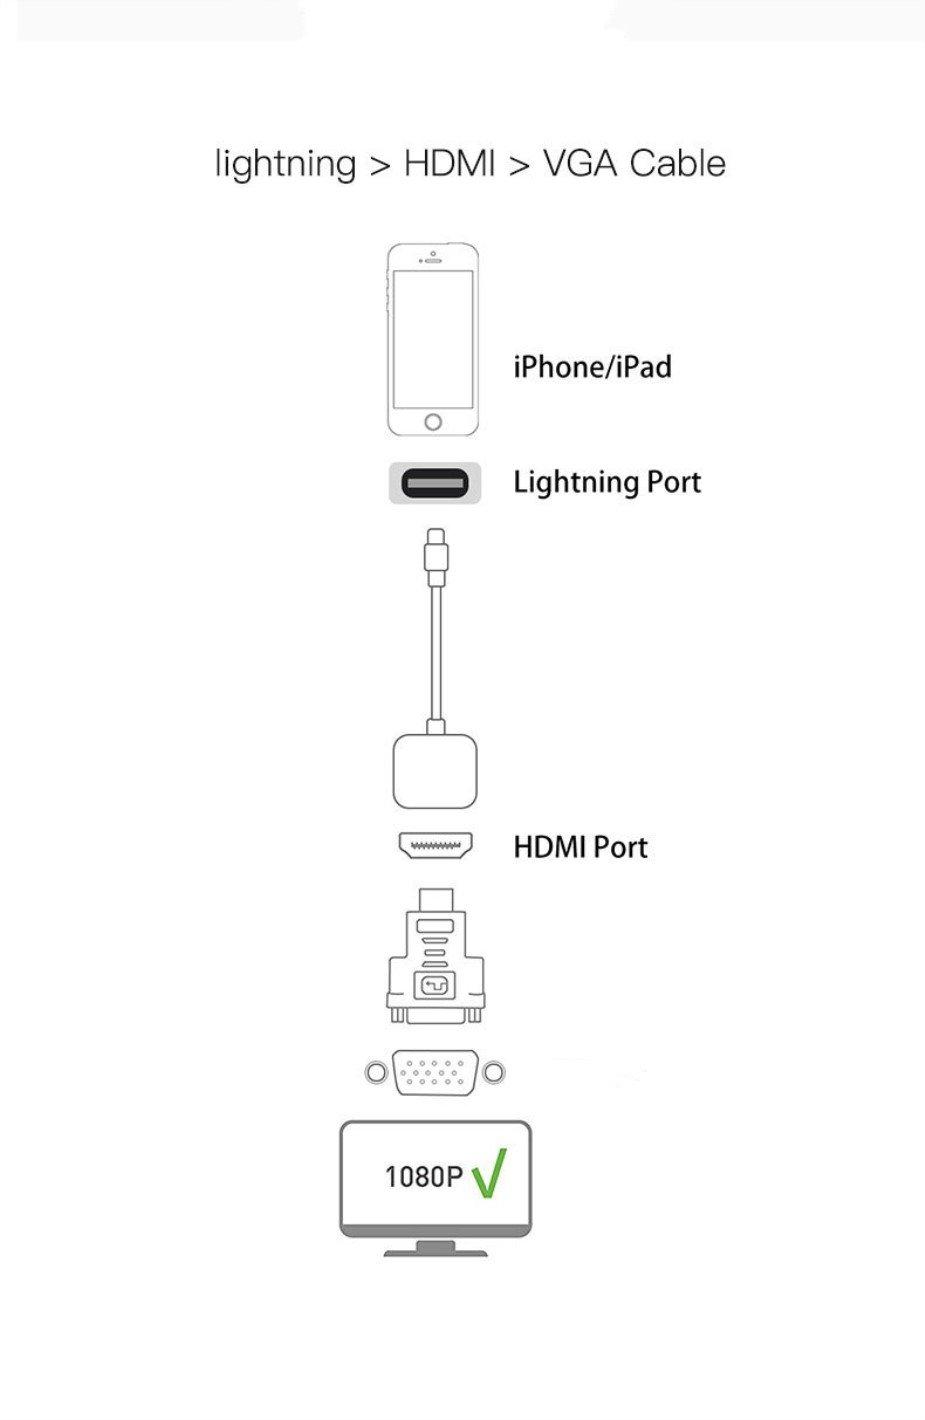 Lightning to HDMI adapter converter, Lightning AV adapter, NOTTODAY for iPhone X 8 7 6 5 iPad iPod on HDTV Monitor projector, 2 in 1 Plug and Play 1080P Audio AV Connector